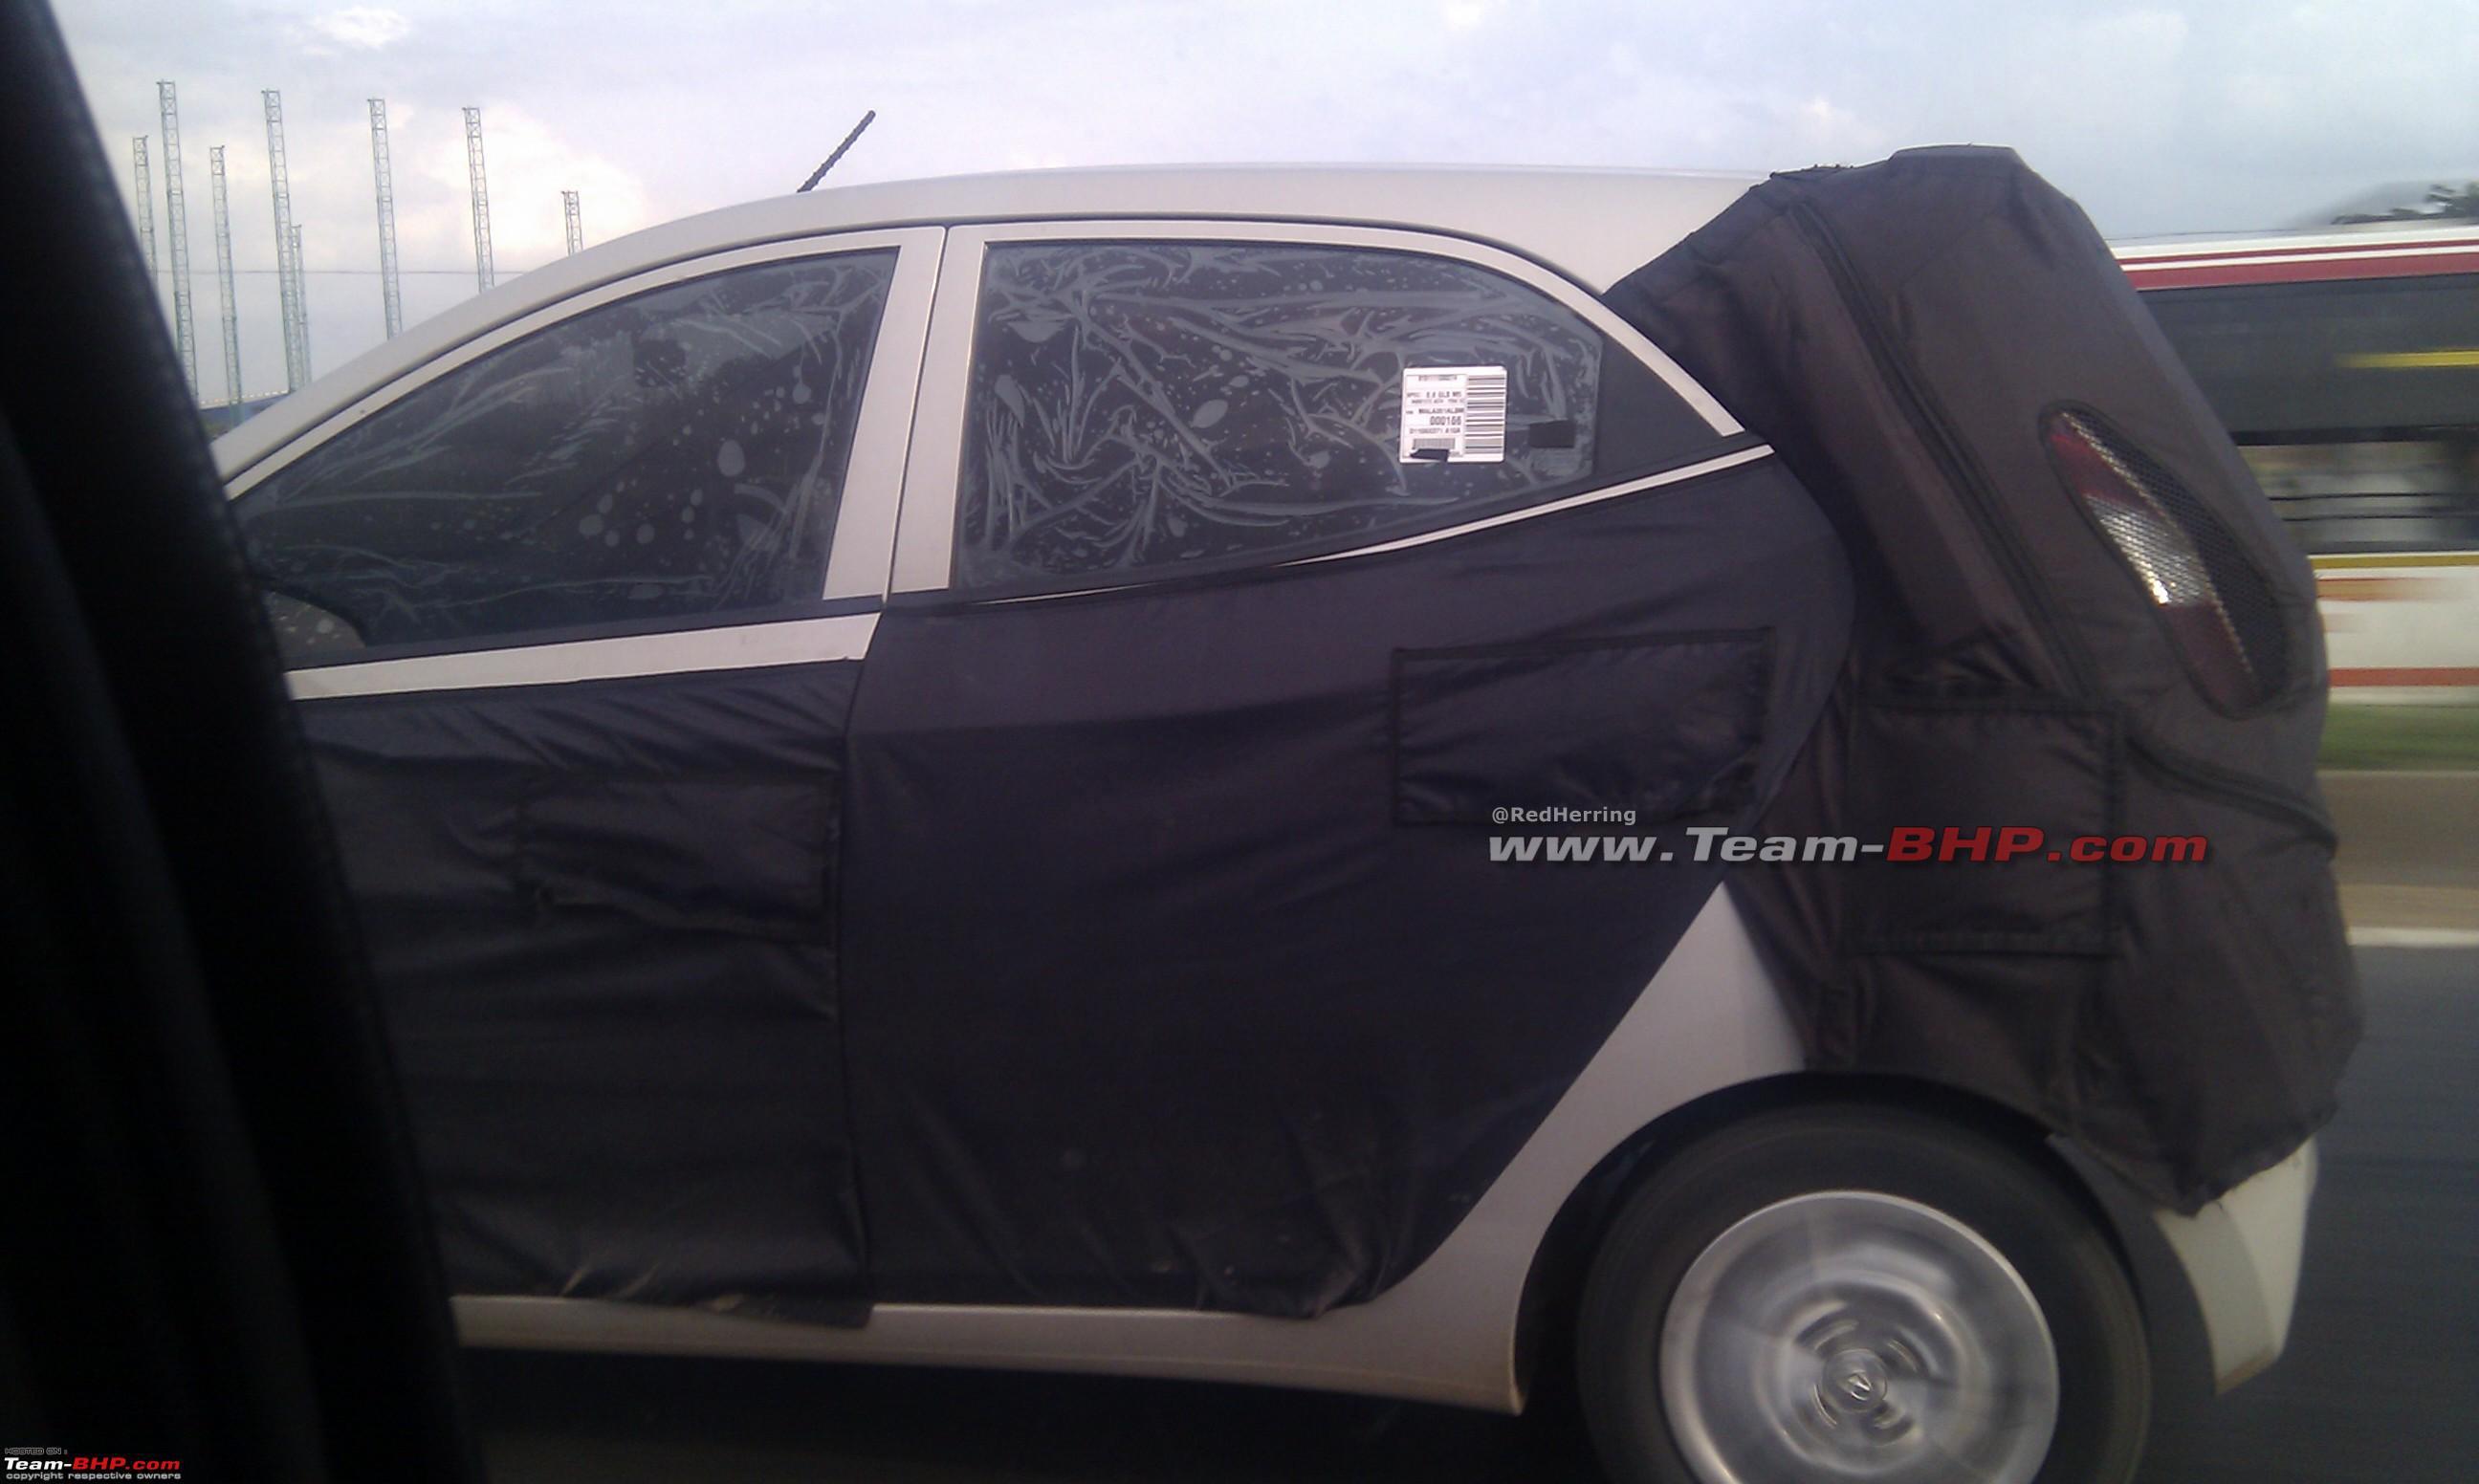 Hyundai Eon Now Launched Prices Between 2 7l 3 71l Ex Delhi